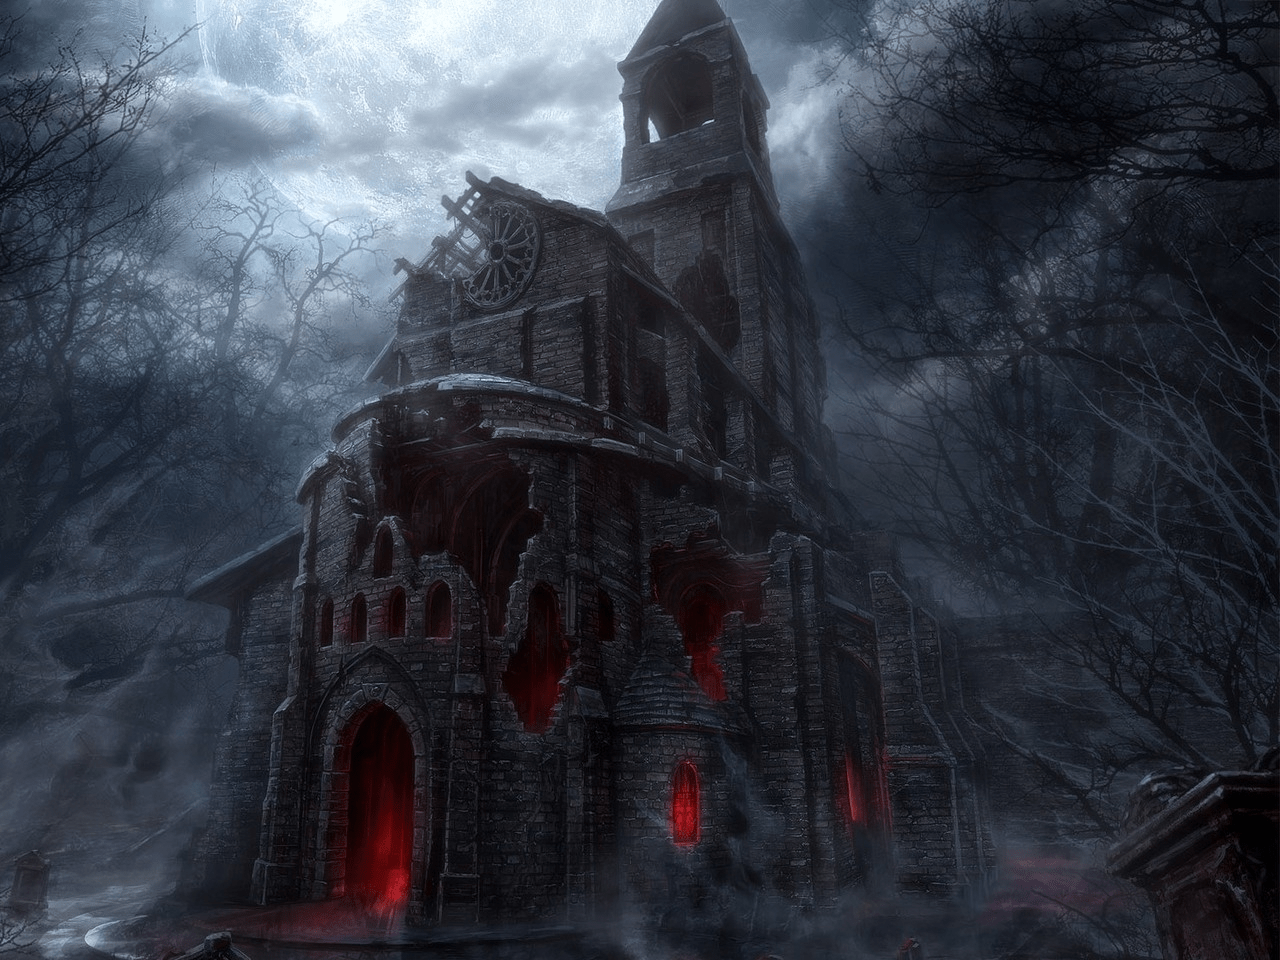 2013 halloween haunt awards | hollywood gothique